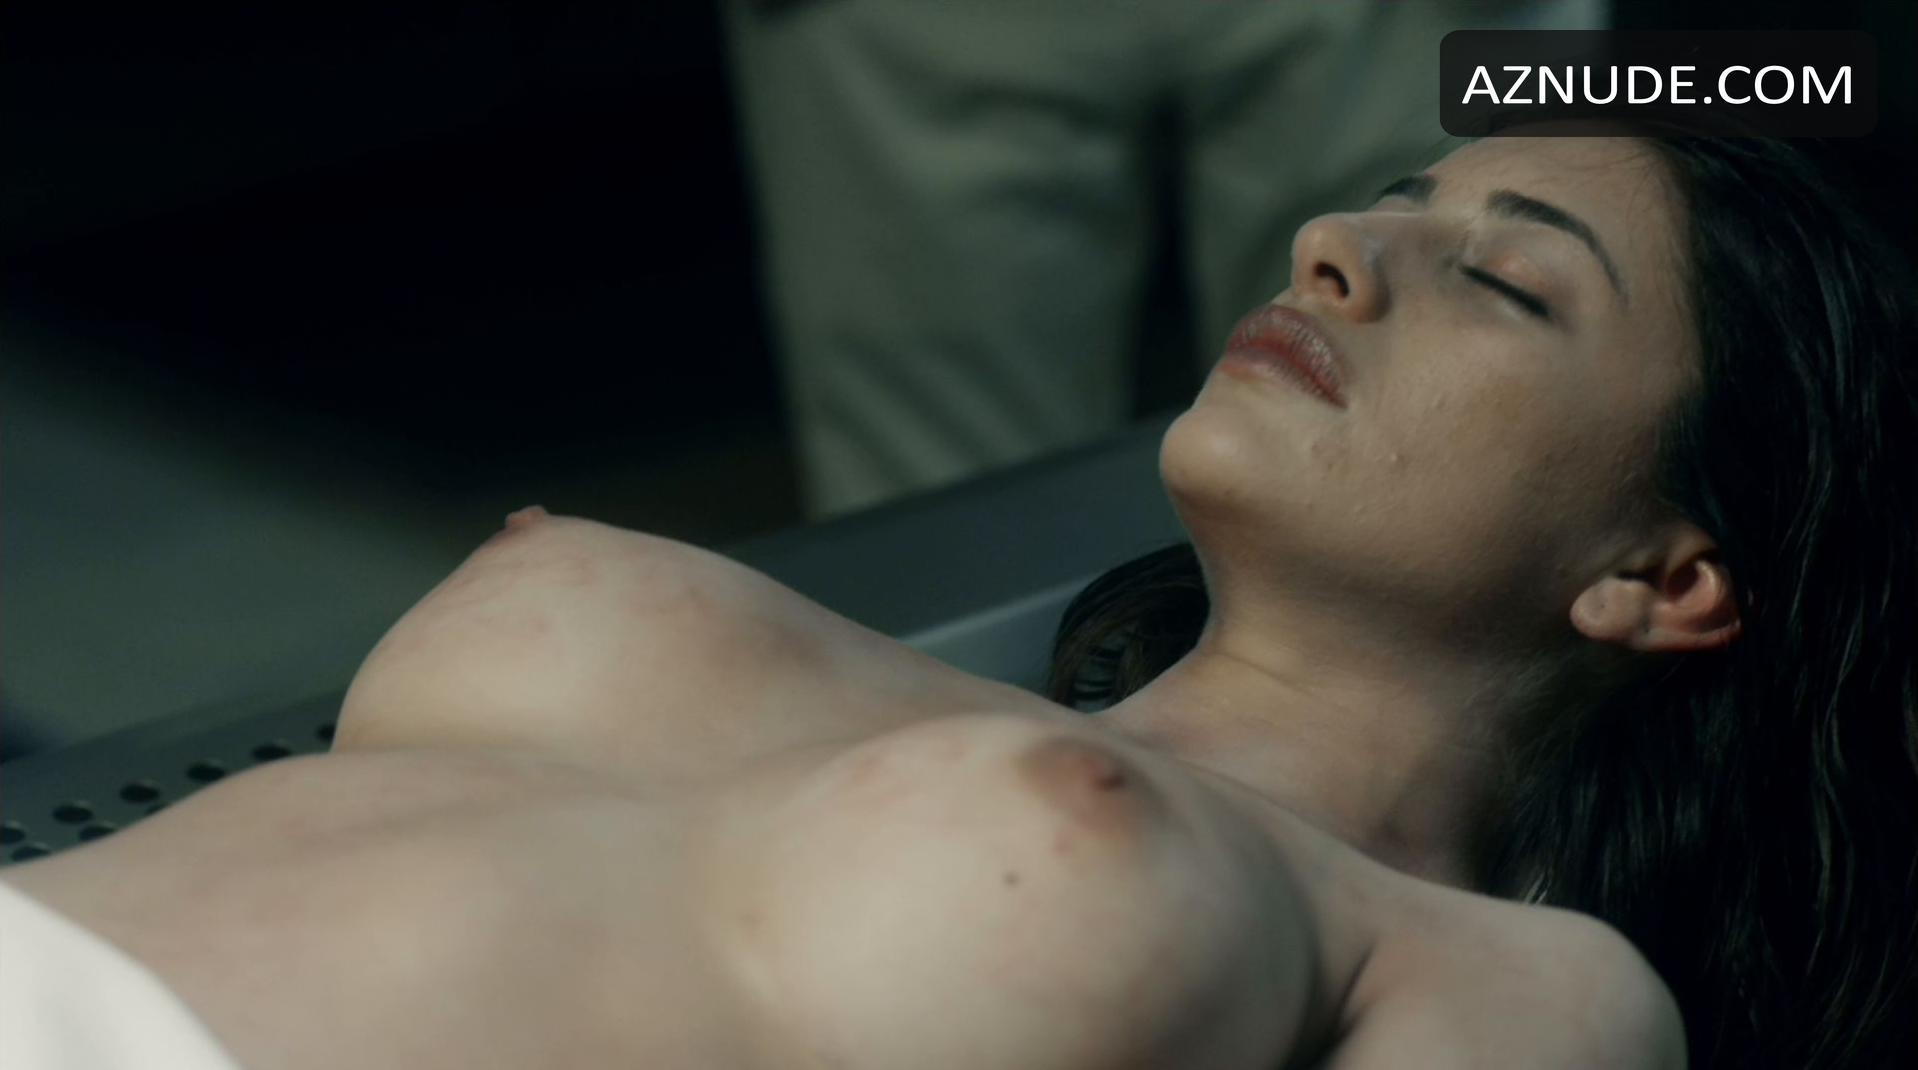 Mayra leal nude new pics